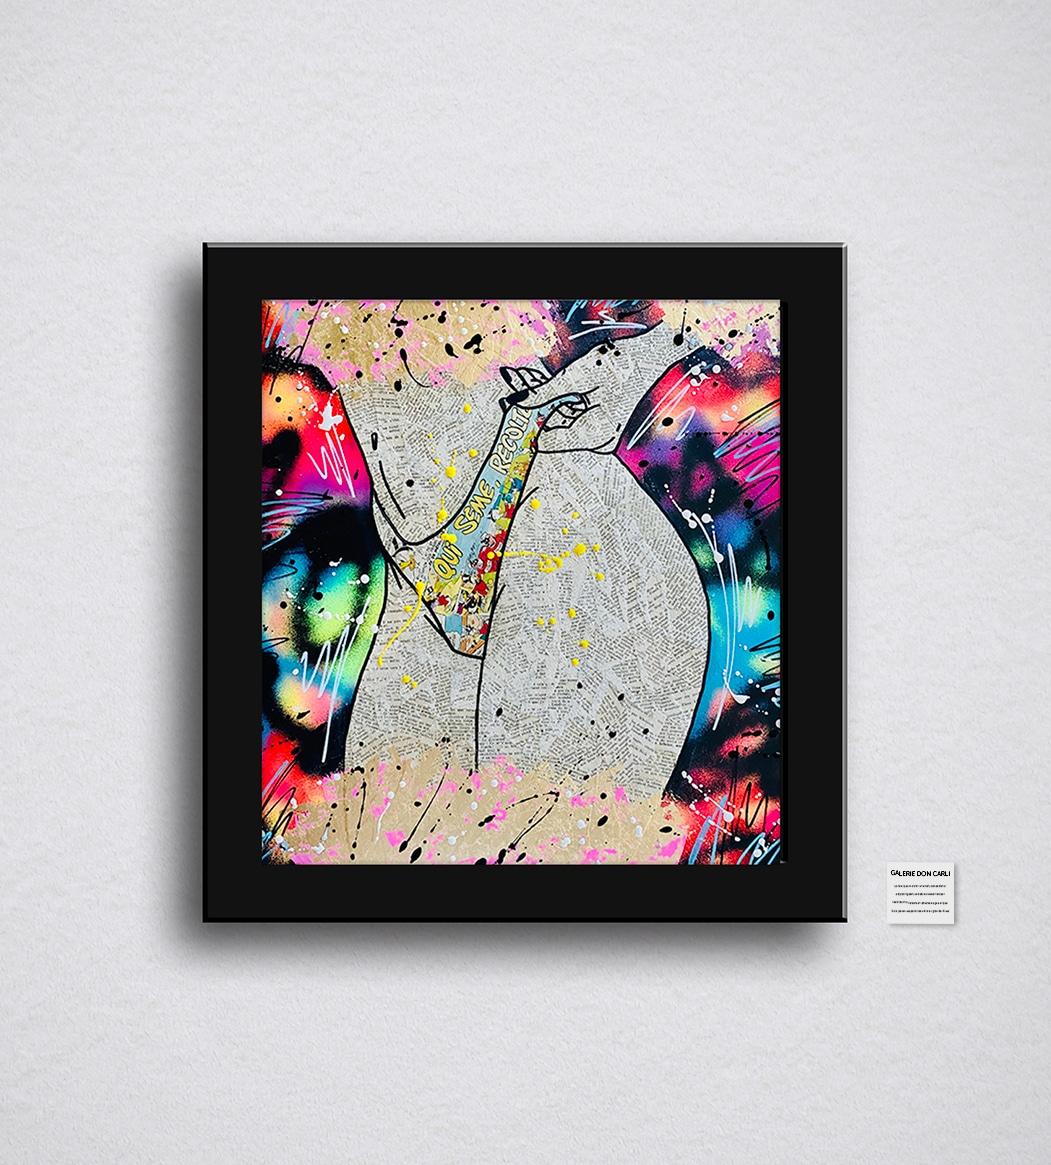 qui-seme-recoltte-julie-houdemont-galerie-don-carli